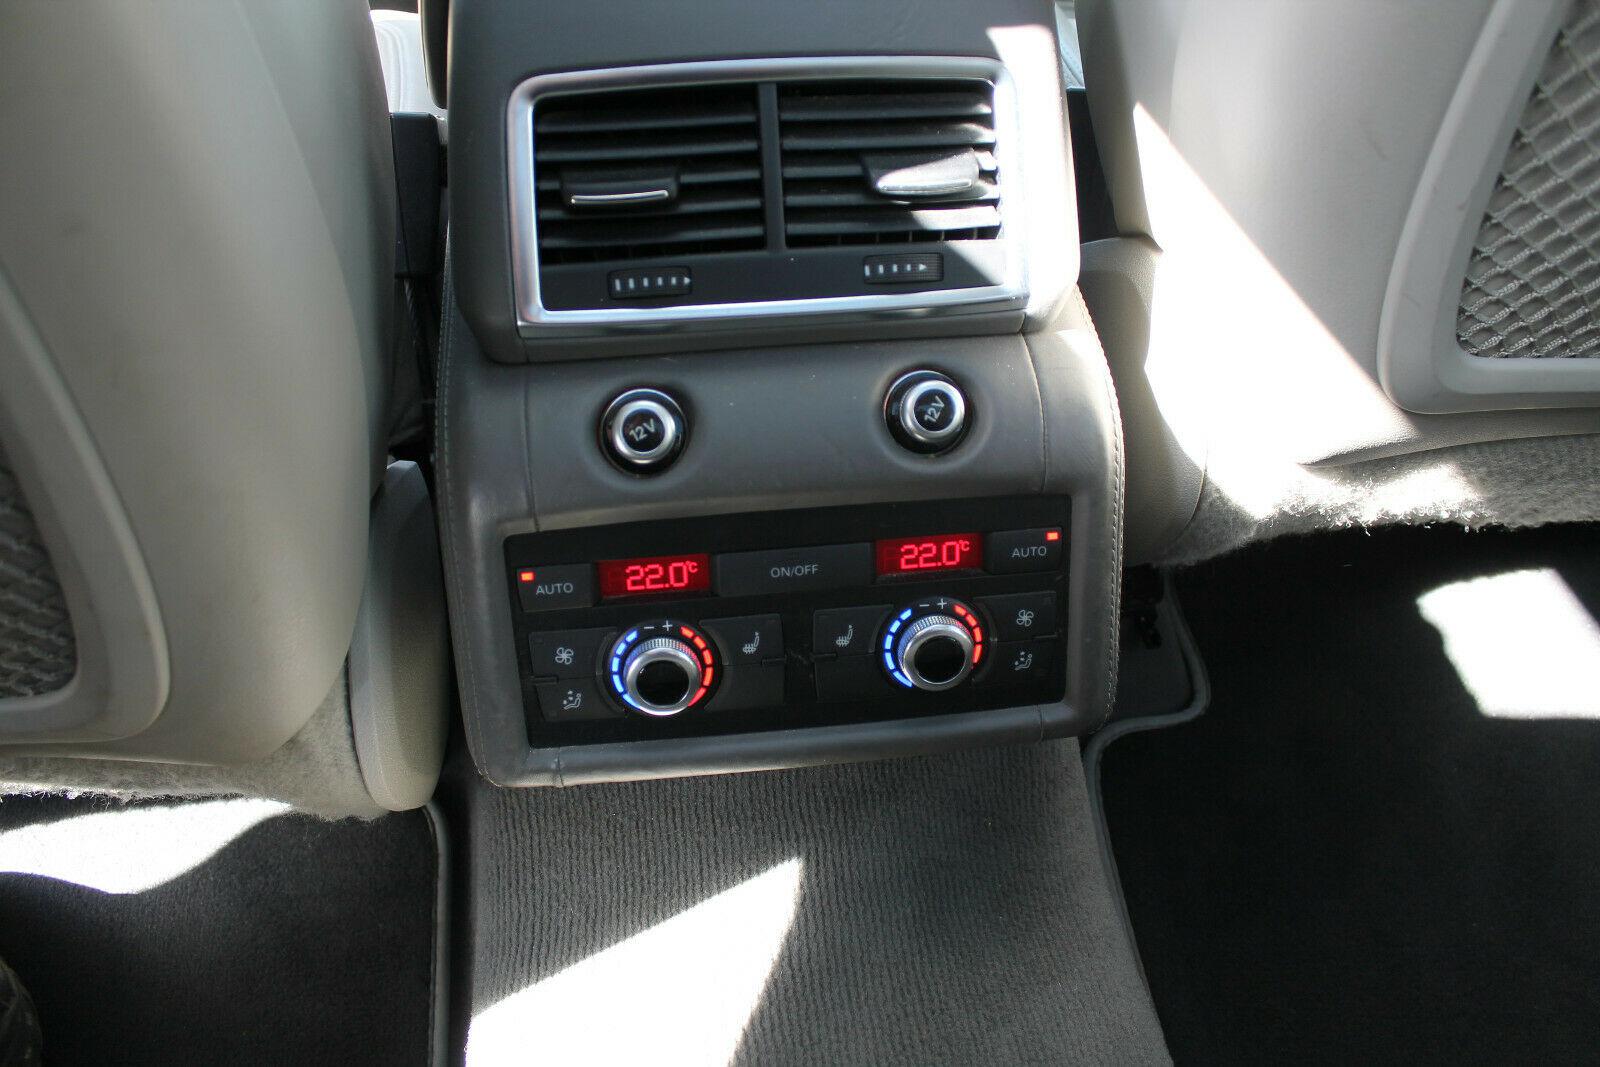 Audi Q7 V12 TDI climatisation automatique